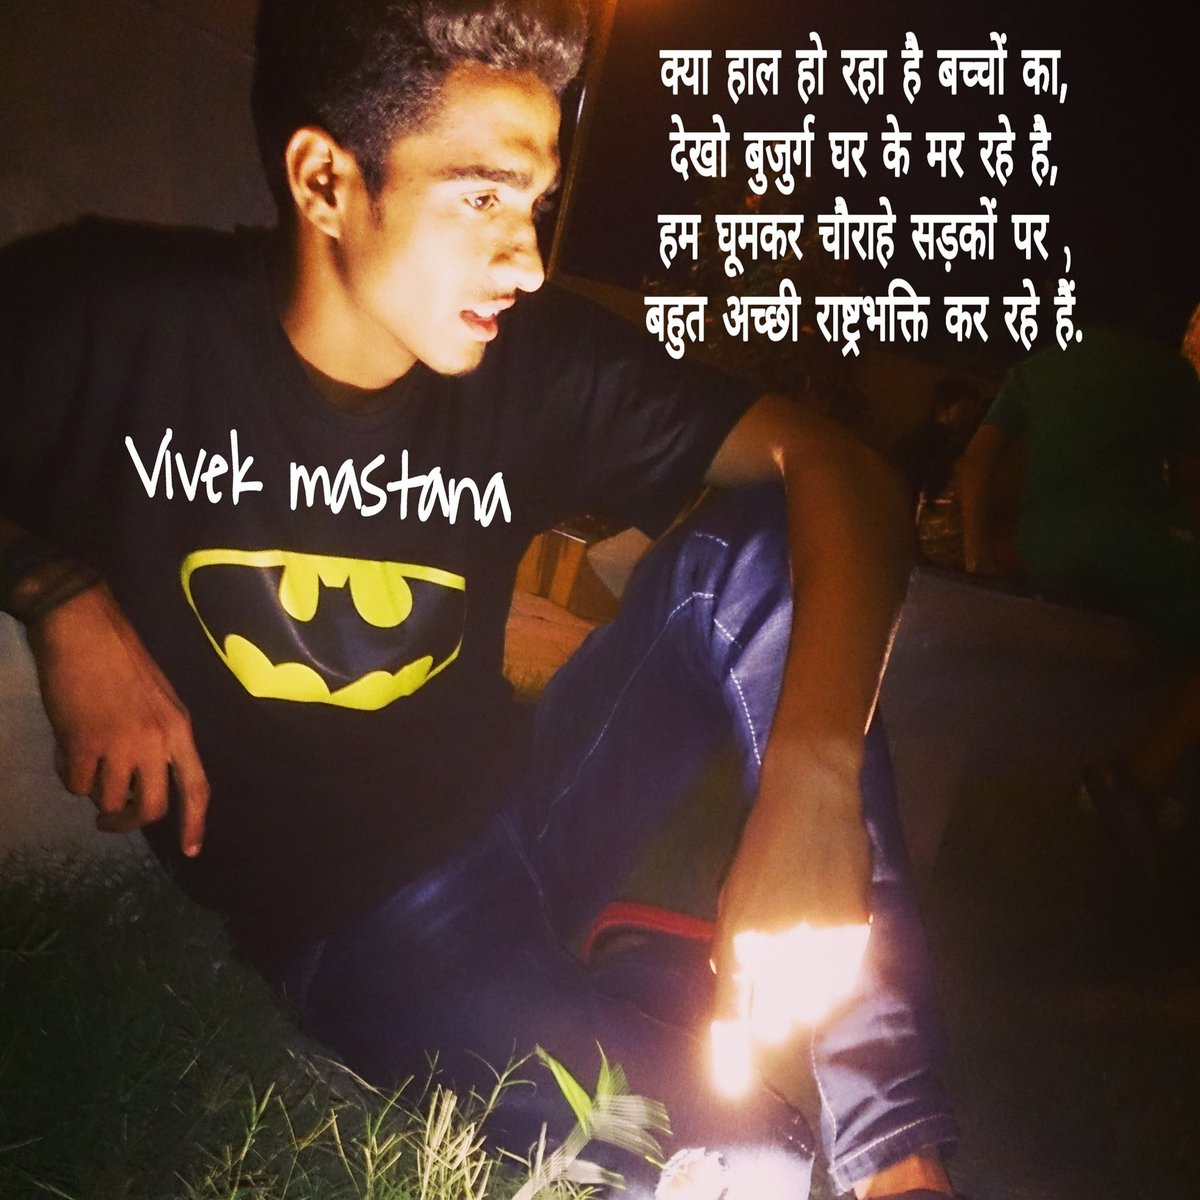 #shayari143 #shayariquotes #shayarilover #dilkibaatein #khamoshiyan #nazmila #alfaromeo #alfaromeogiulia #relationships #rekhtashayari #rekhtafoundation #amar #amarujalakavya #MumbaiPolice #mumbairains #filmcitymumbai #nazm #khalid #shayarilover #gazal #shayariquotes #hindisongspic.twitter.com/SNjl00bQc9